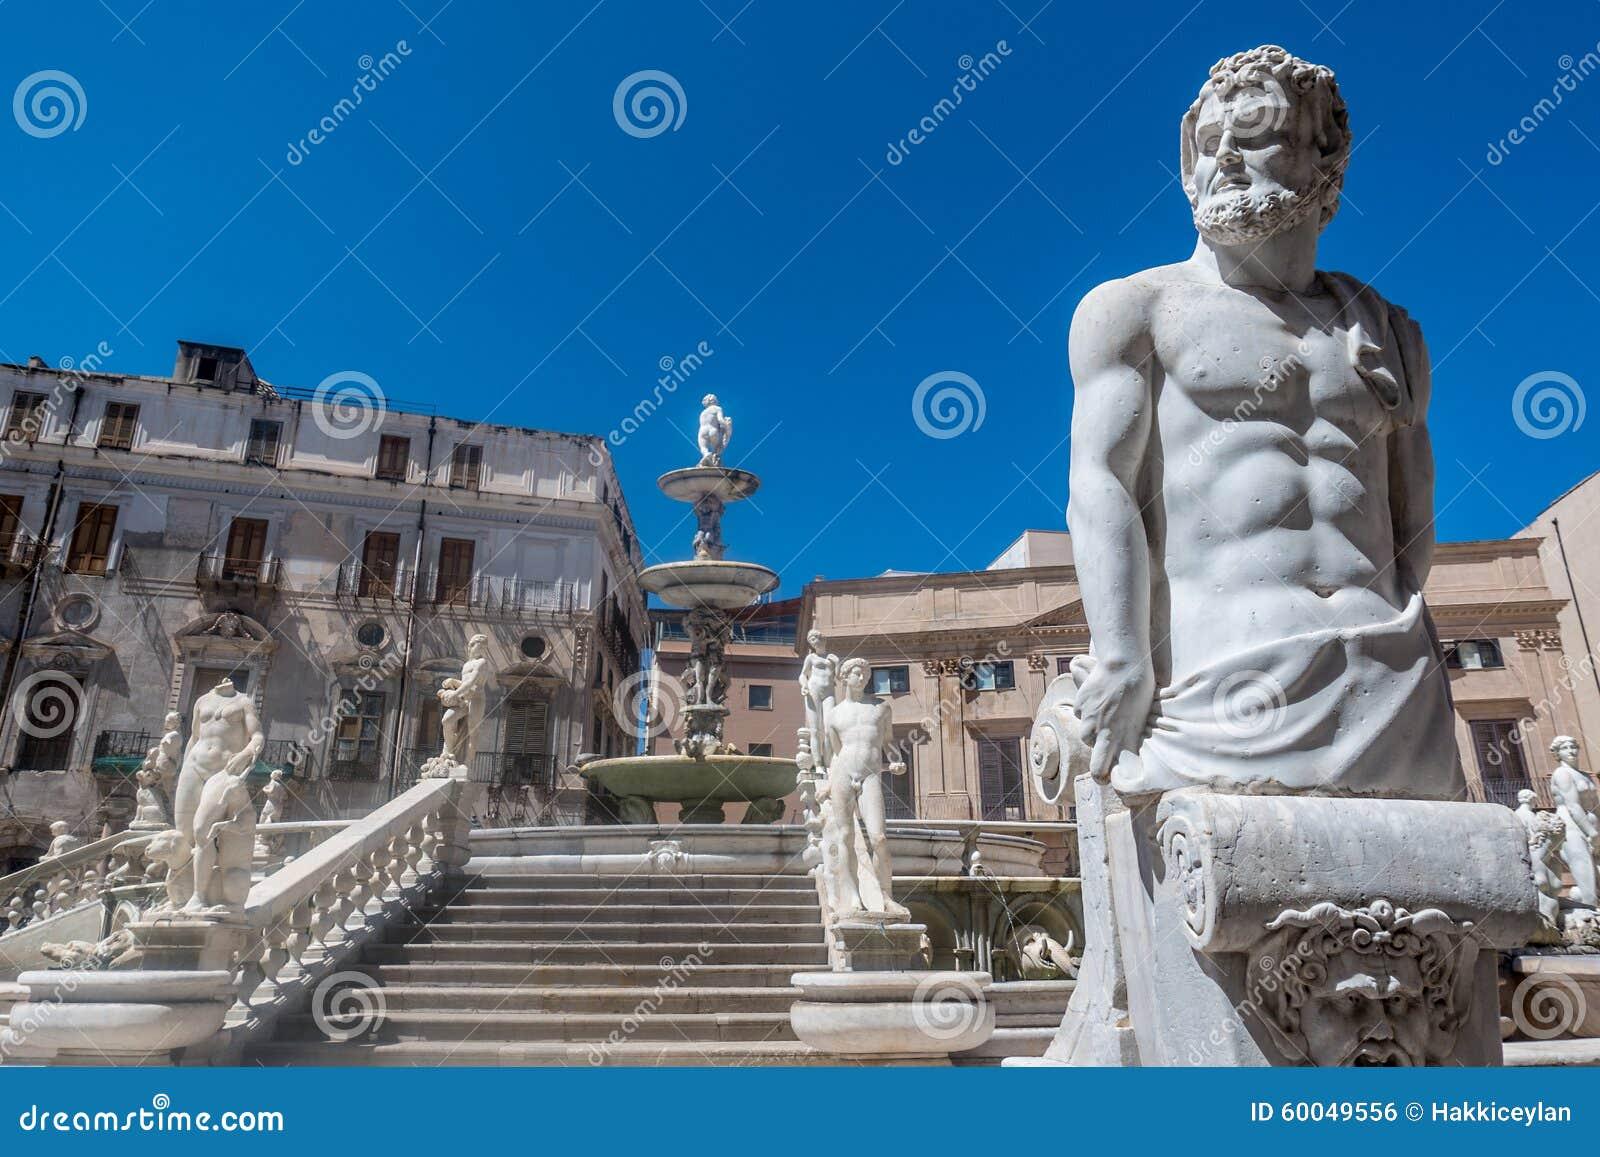 Estatuas de mármol en la escalera, Palermo, Italia